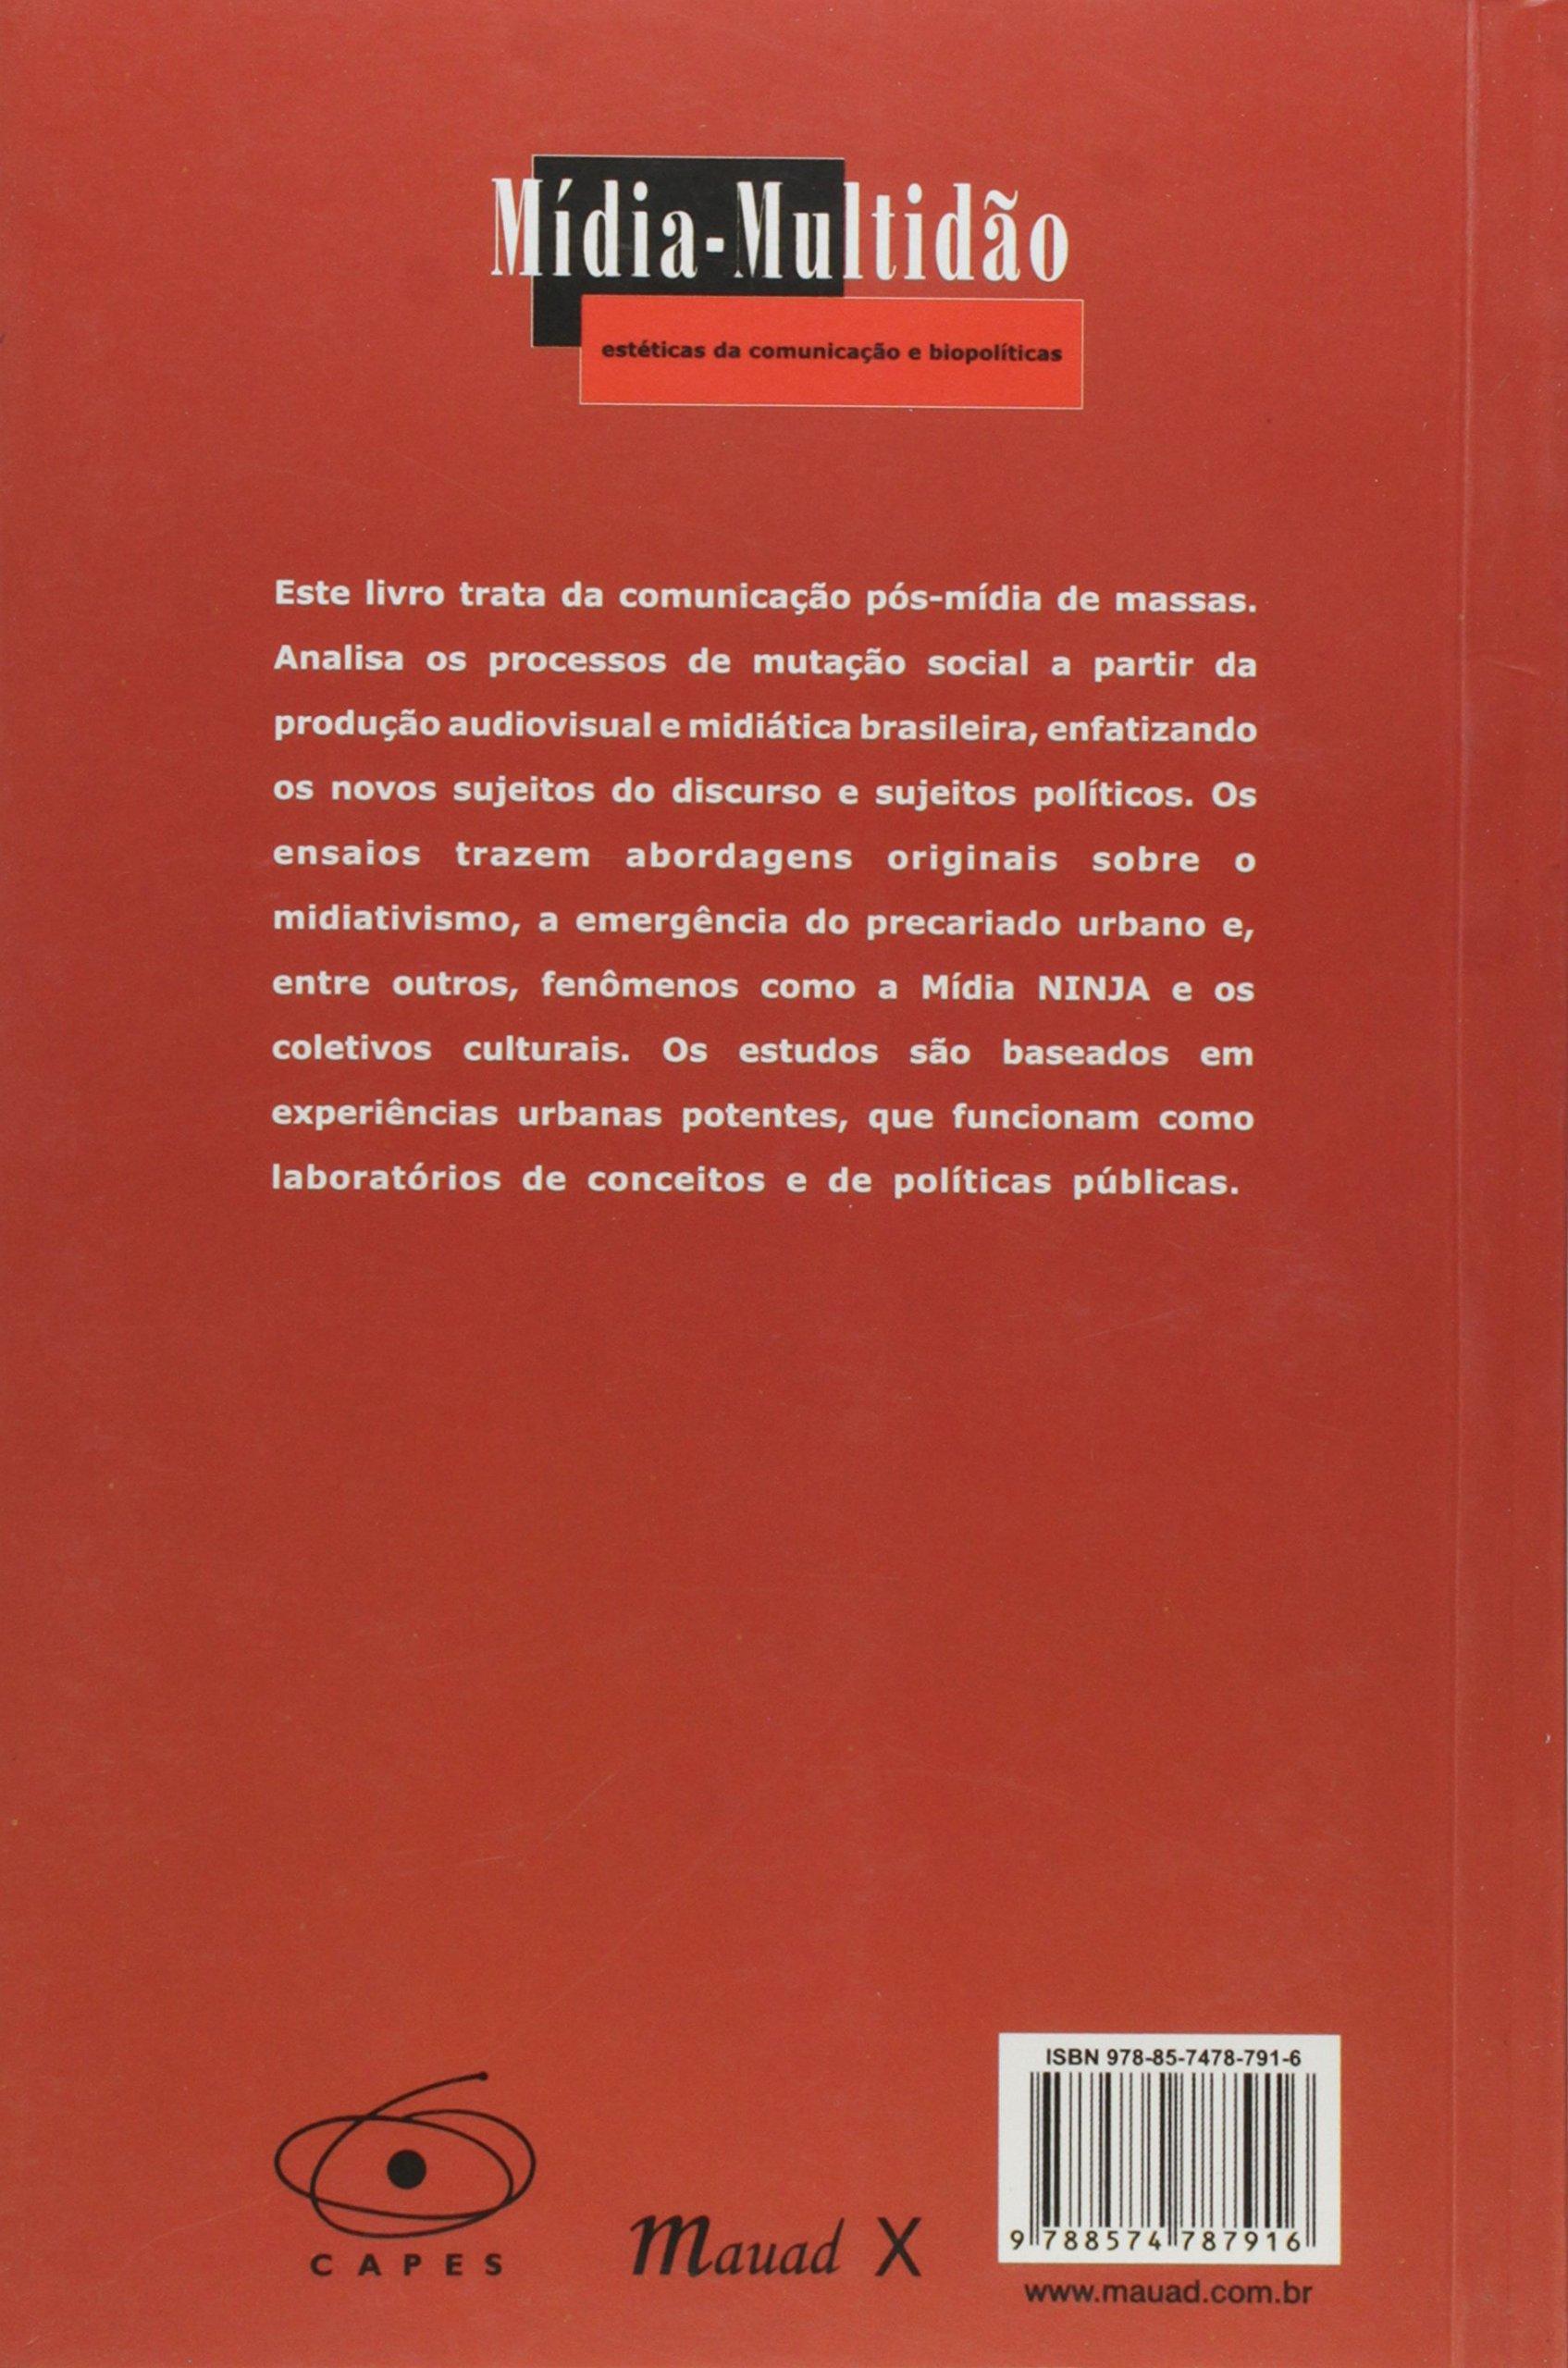 Mídia - Multidão: Amazon.es: Ivana Bentes: Libros